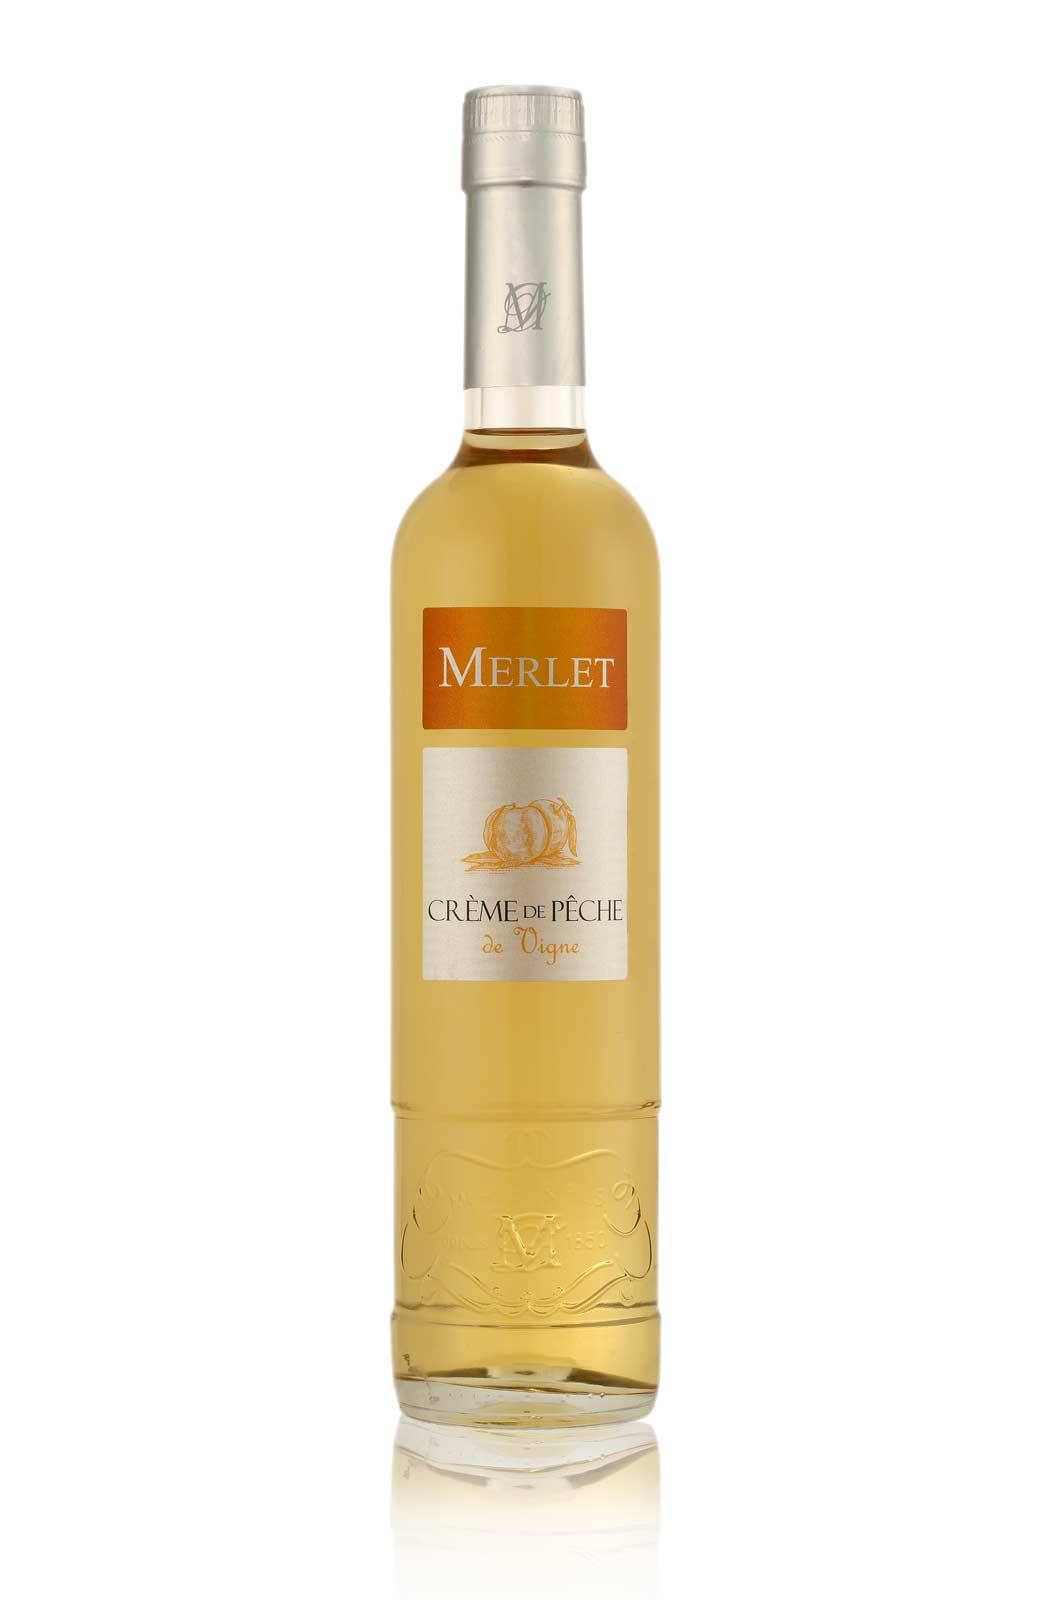 49-merlet-creme-peche-de-vigne